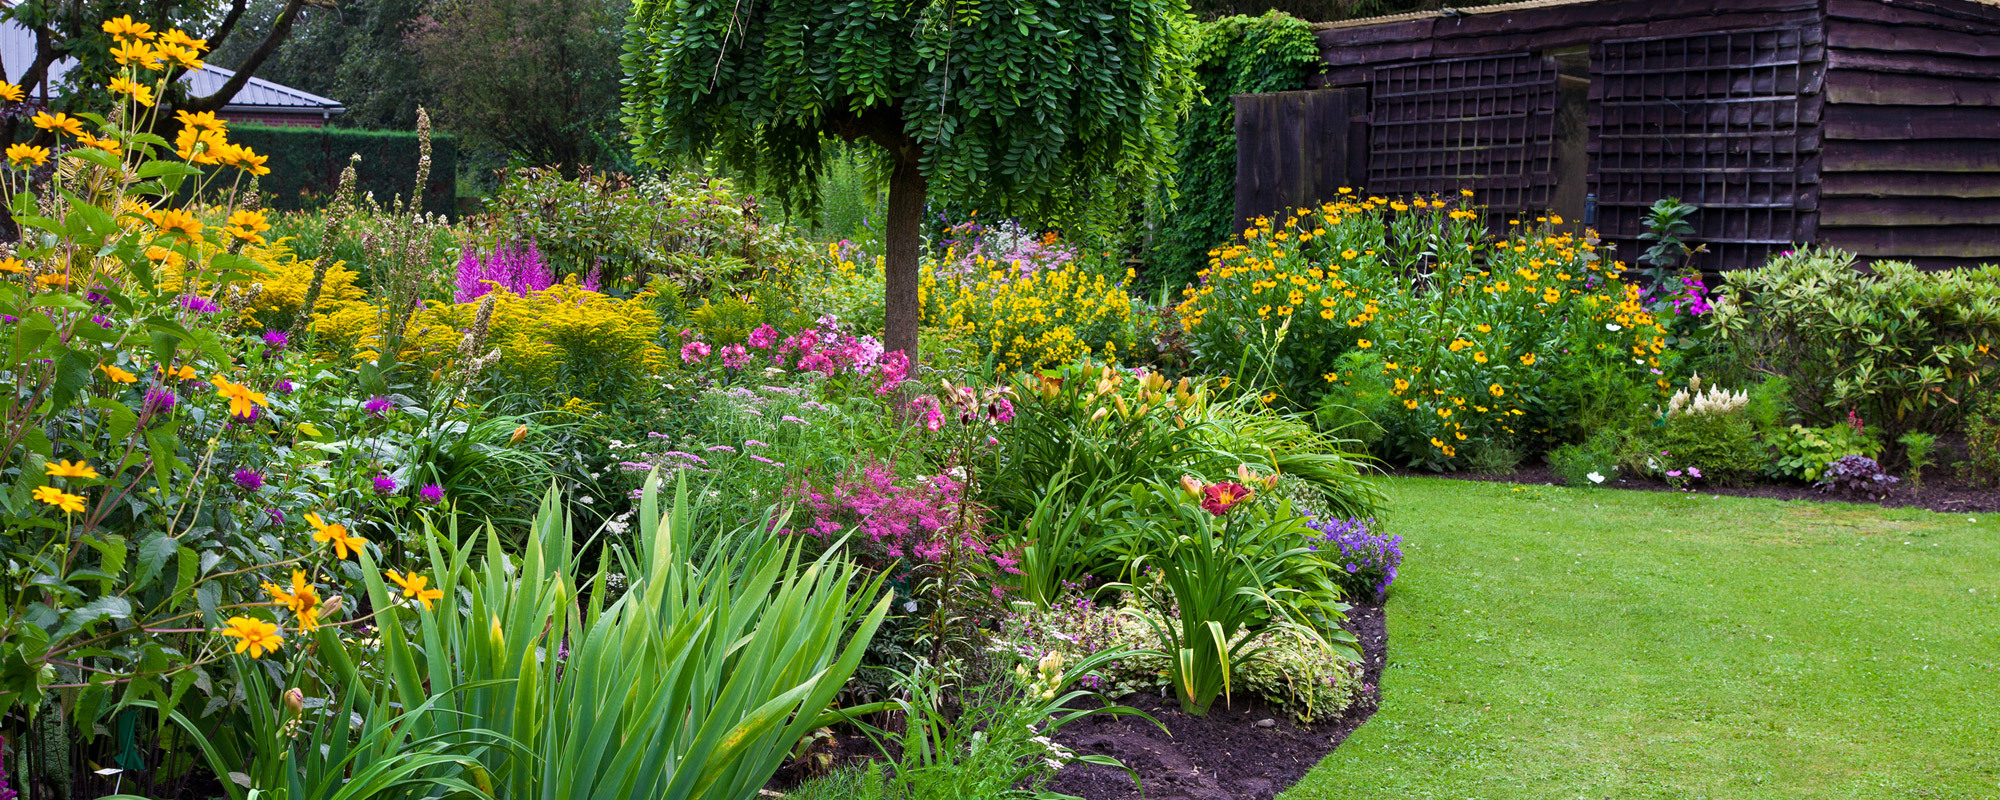 Landscape gardening by professionals